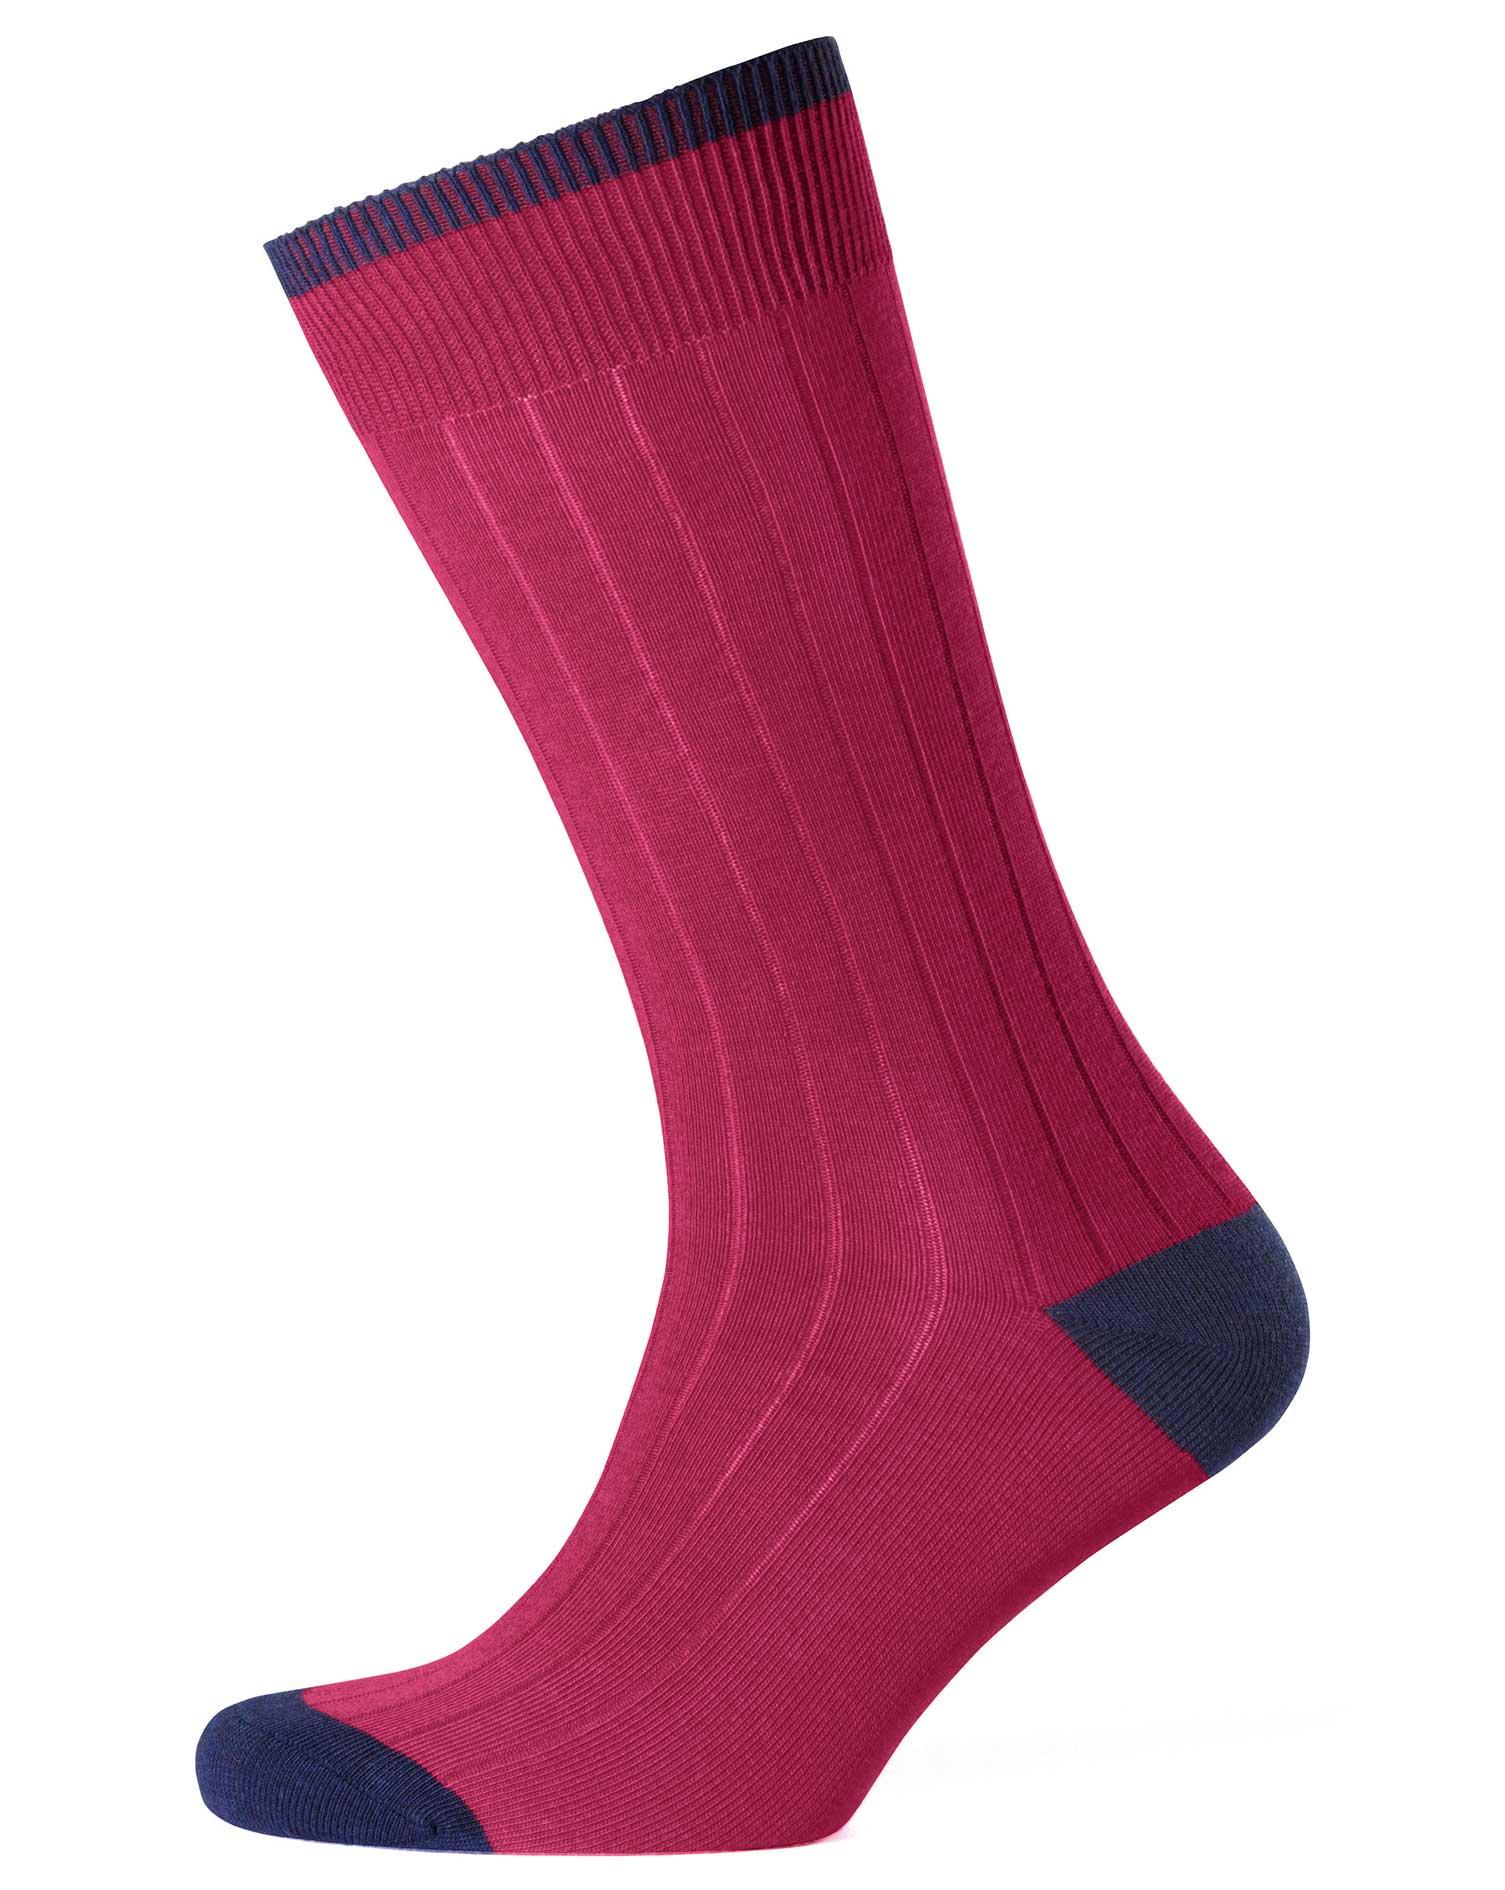 Dark Pink Ribbed Socks Size Medium by Charles Tyrwhitt